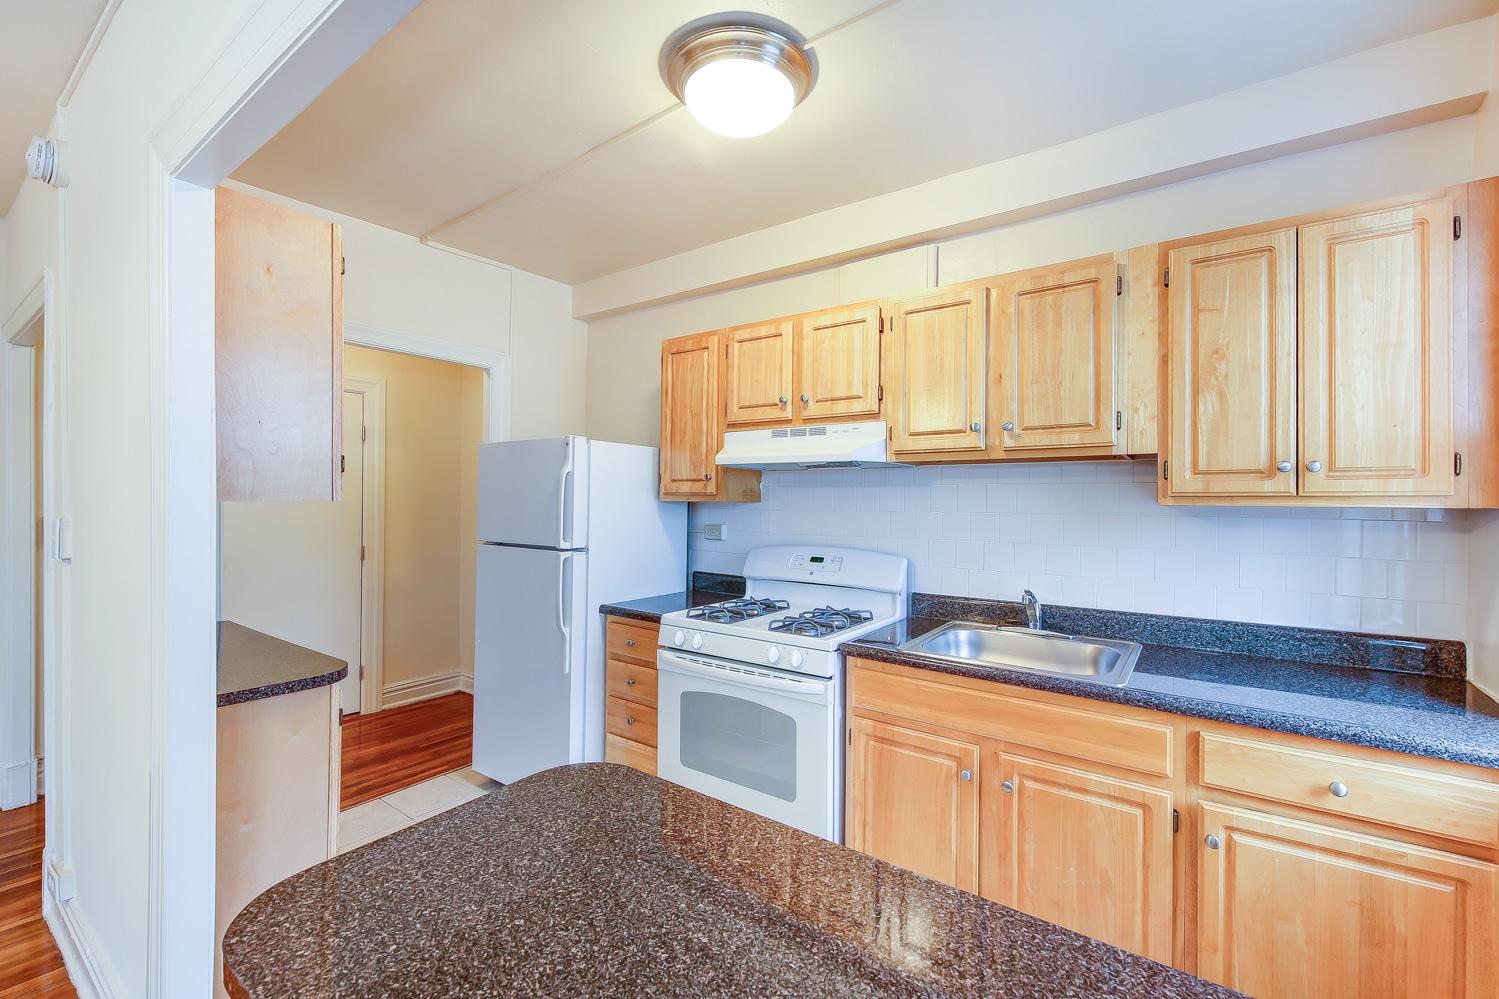 Hampton-Courts-Kitchen-Cabinets-Appliances-Washington-DC ...